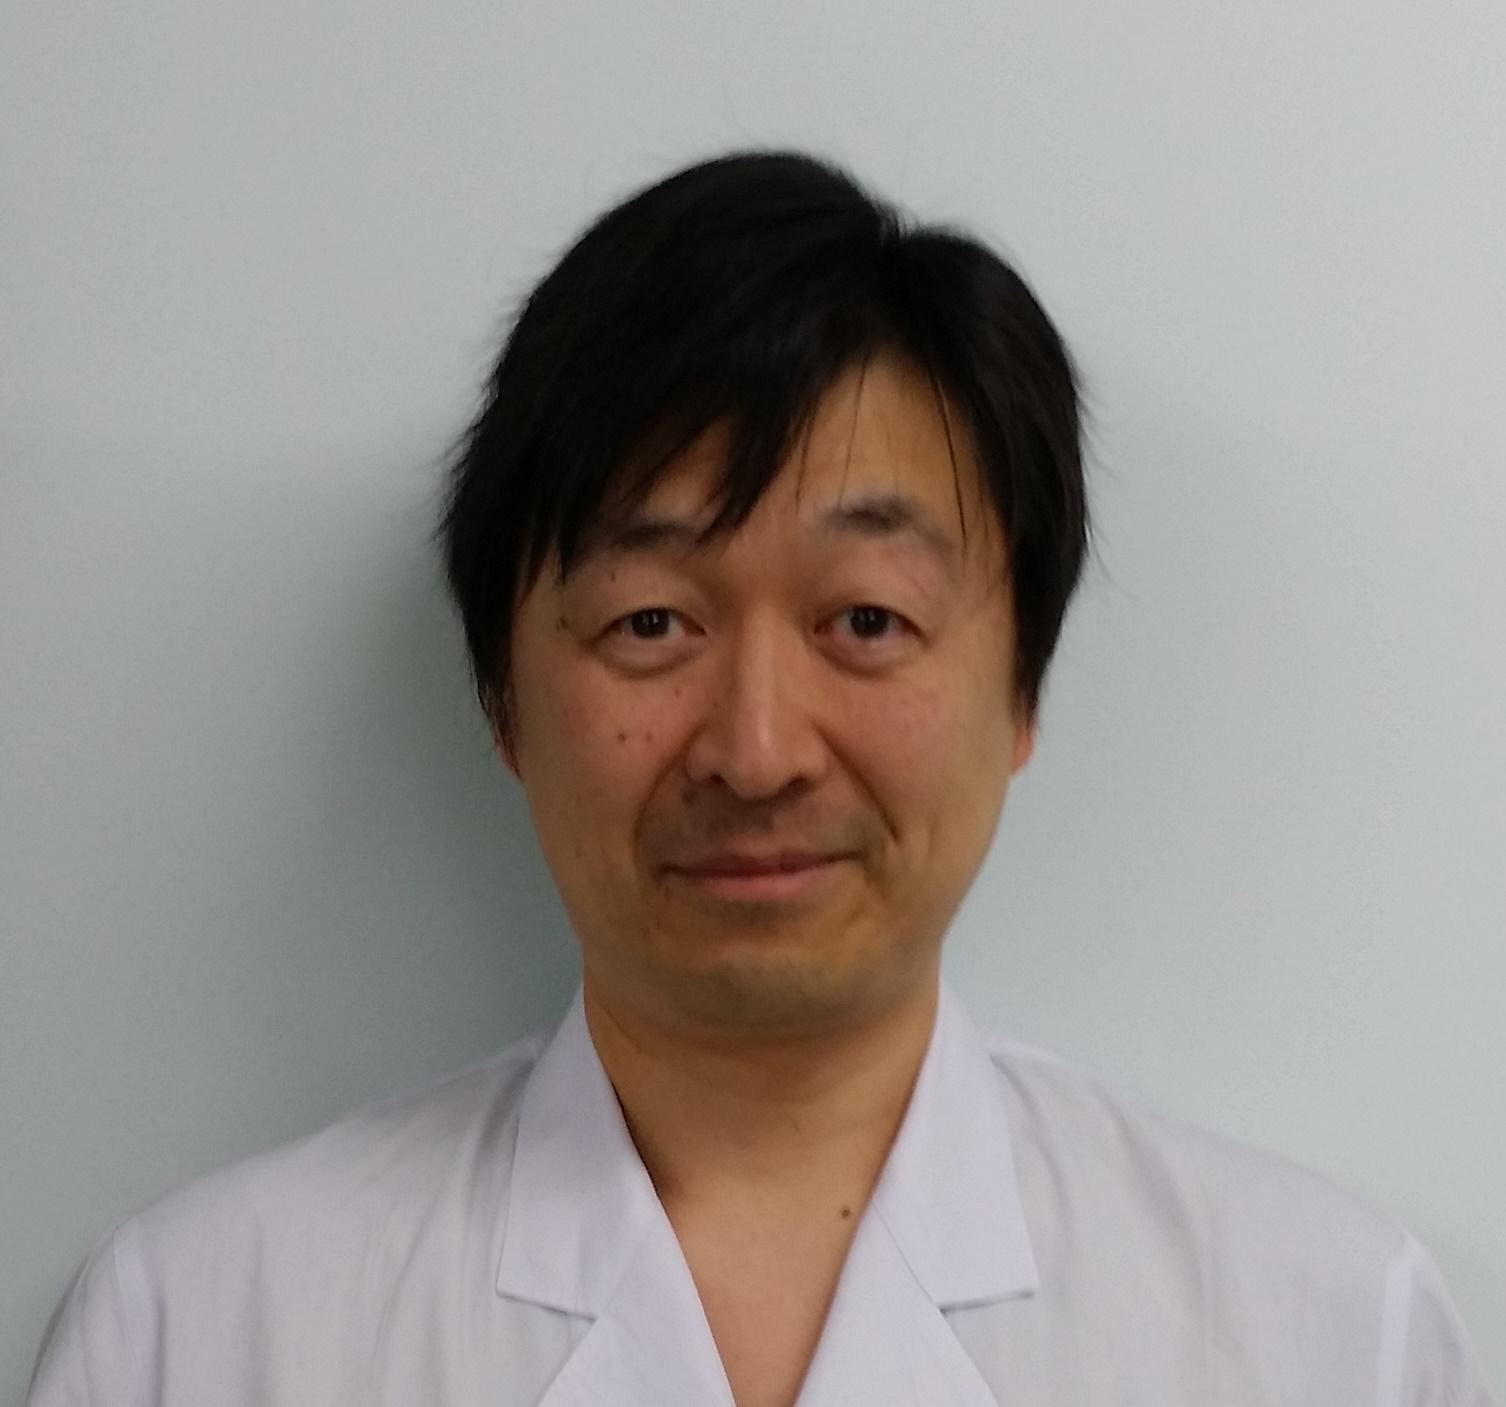 World Journal of Gastrointestinal Pathophysiology